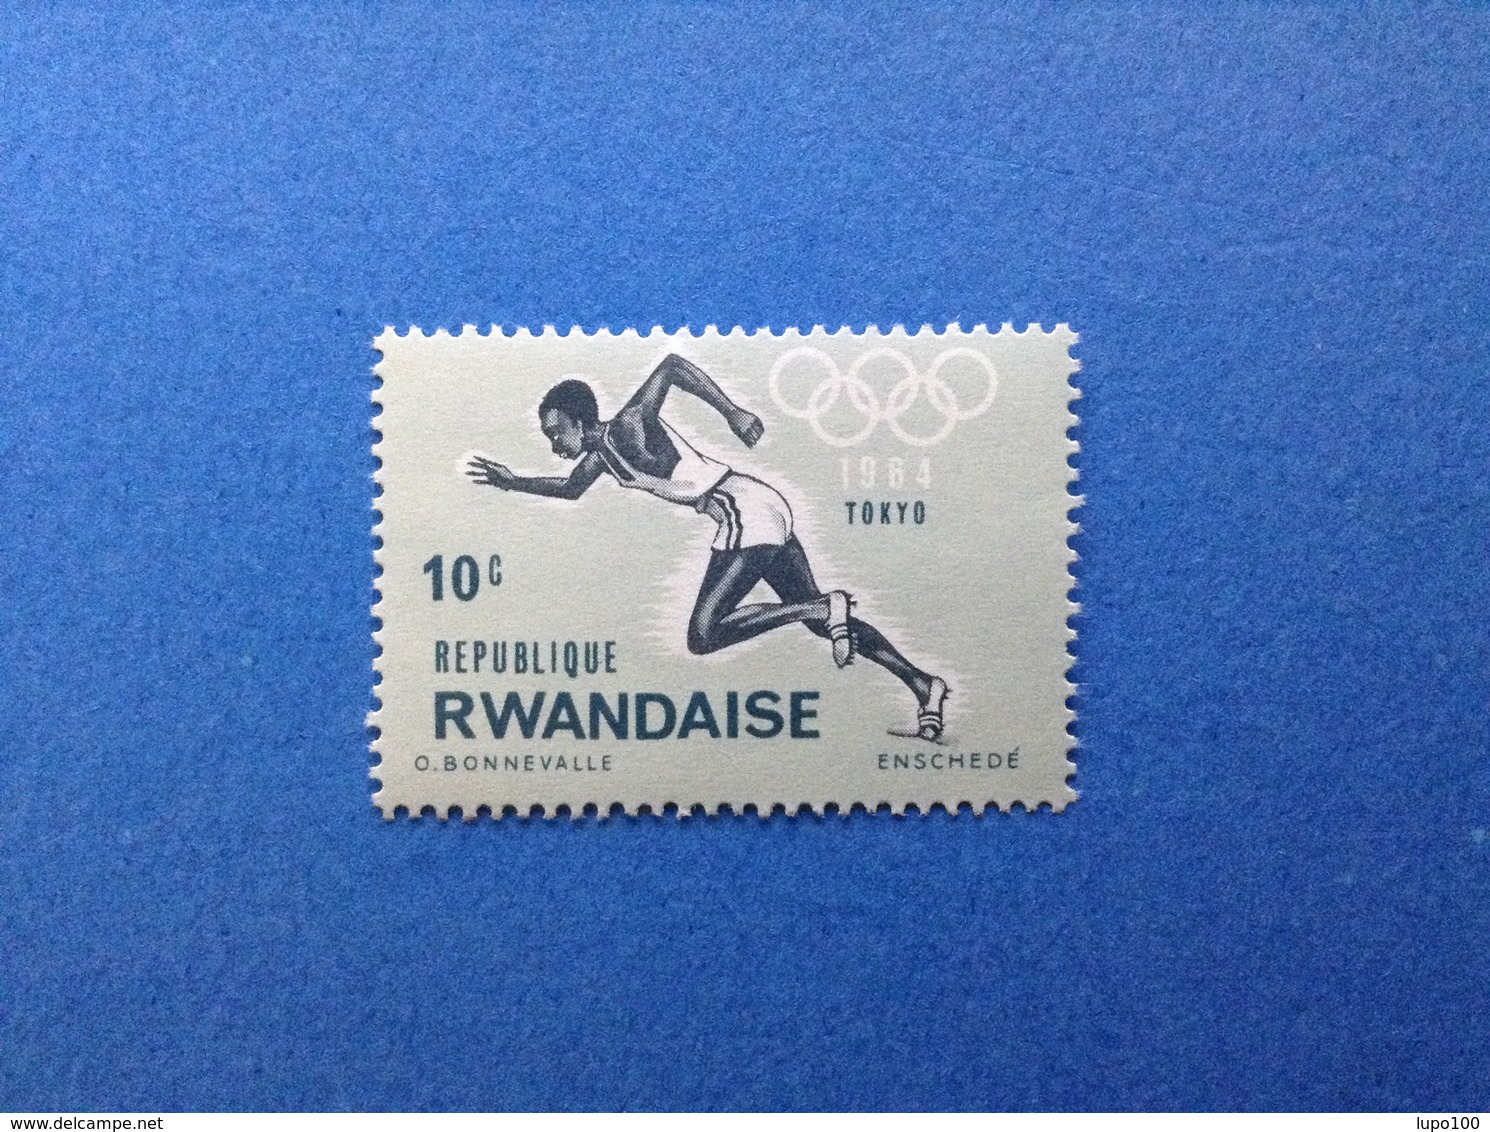 RWANDA REPUBLIQUE RWANDAISE 1964 OLIMPIADE TOKYO 10 C FRANCOBOLLO NUOVO STAMP NEW MNH** - Rwanda